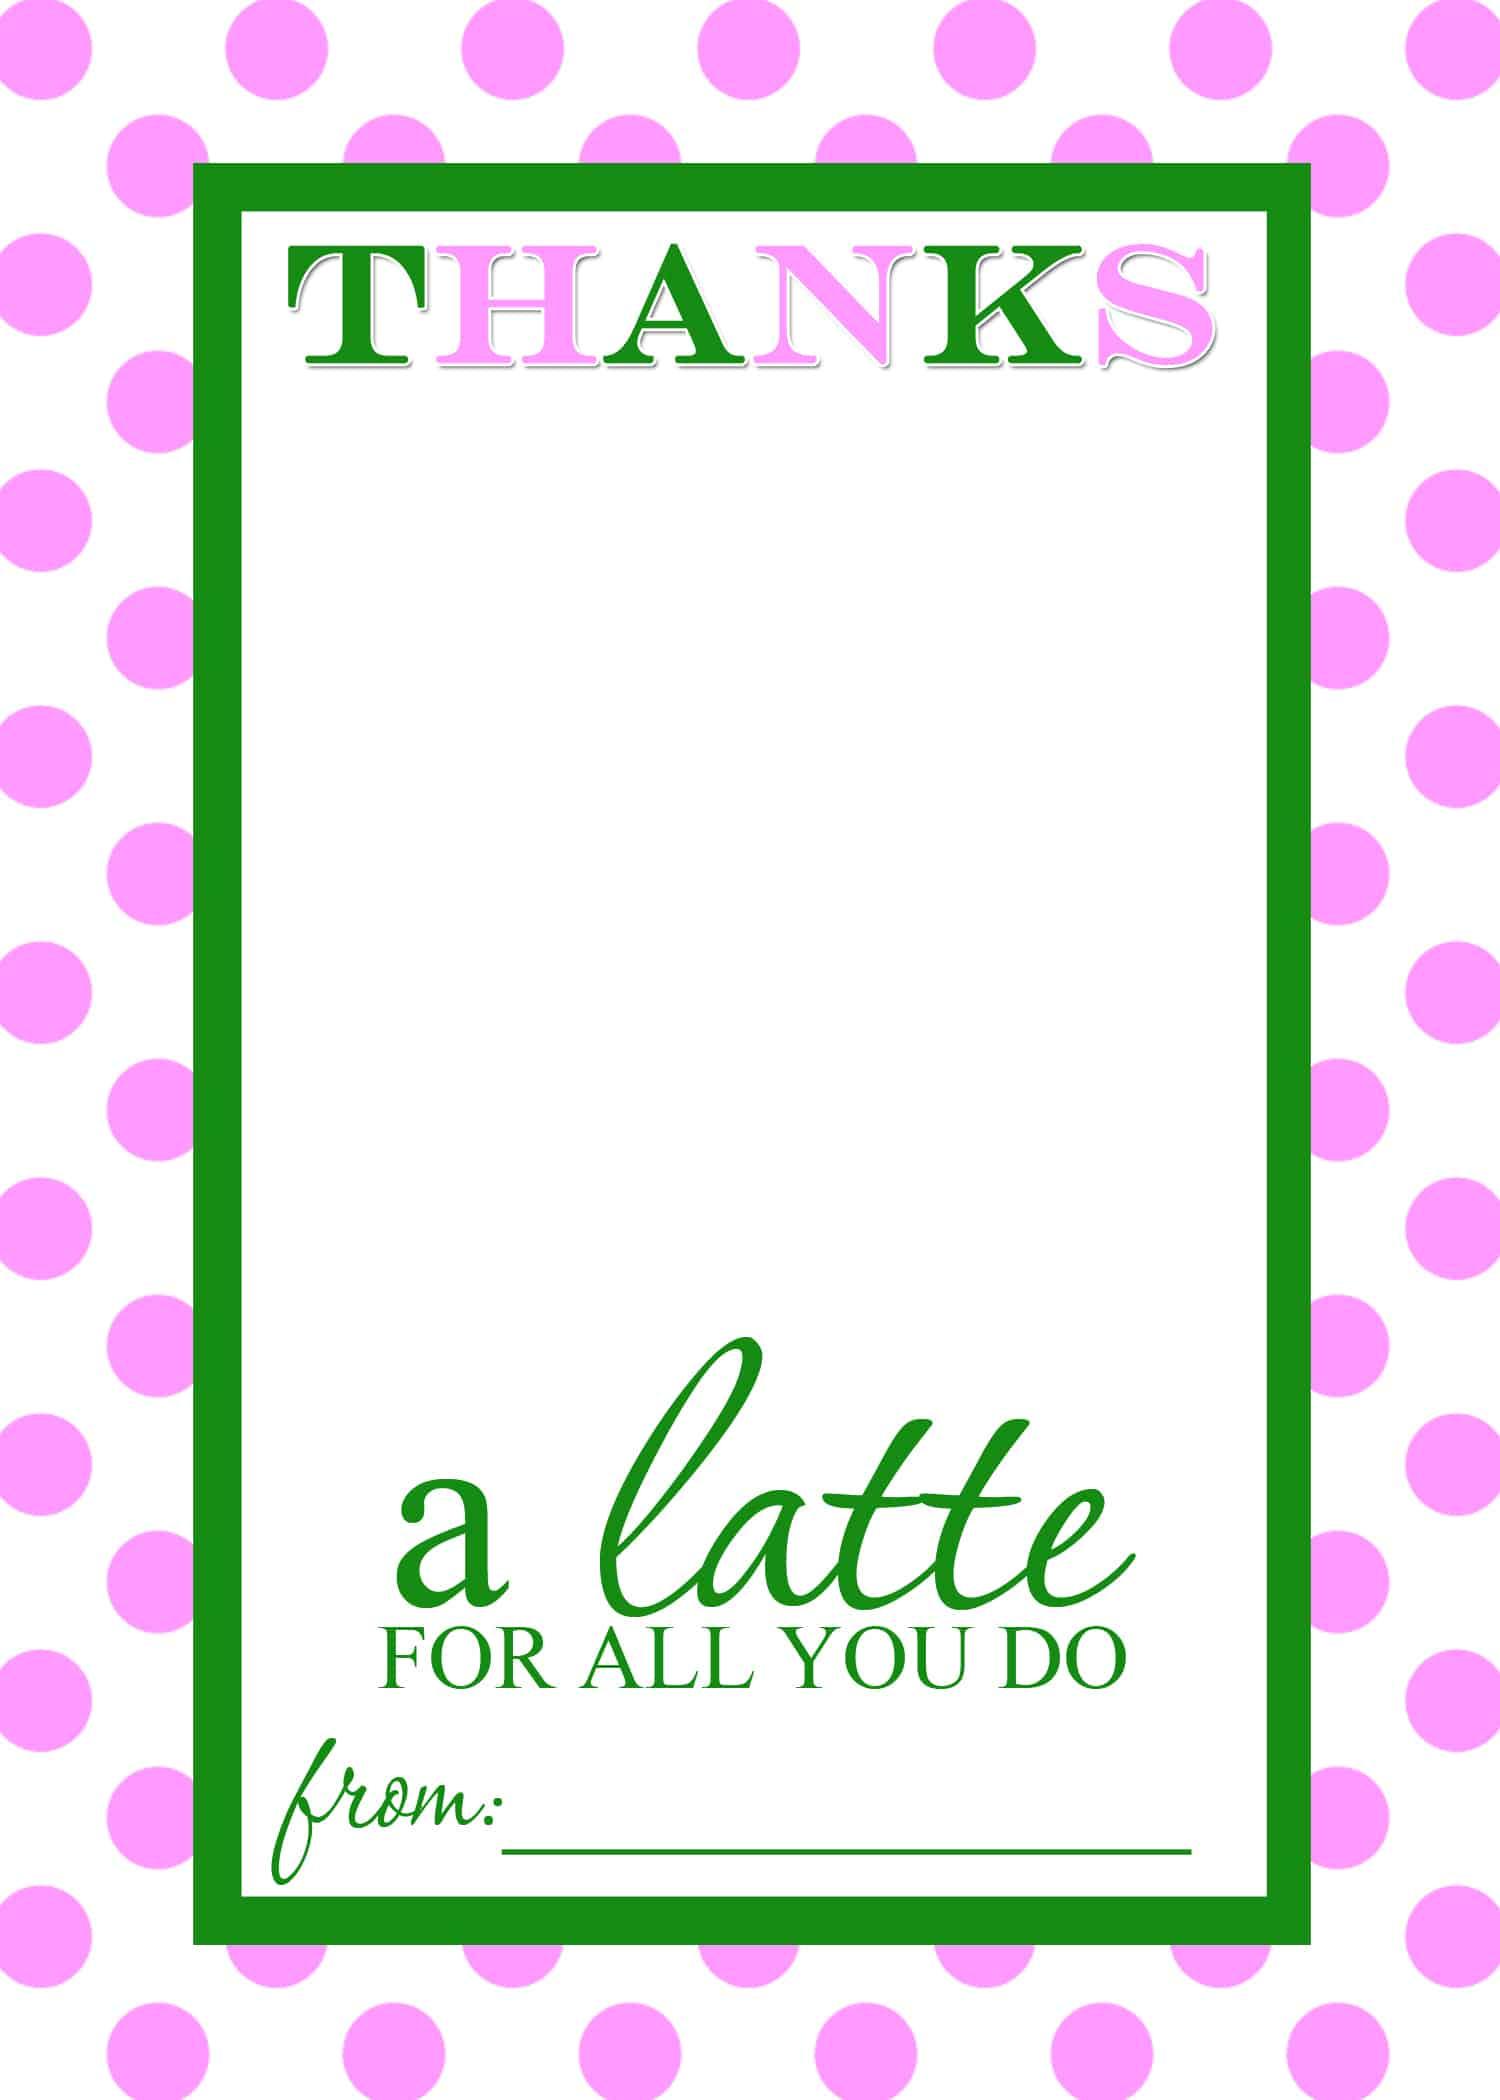 Teacher Appreciation Gift Idea Thanks a Latte FREE Printable – Free Printable Templates for Teachers